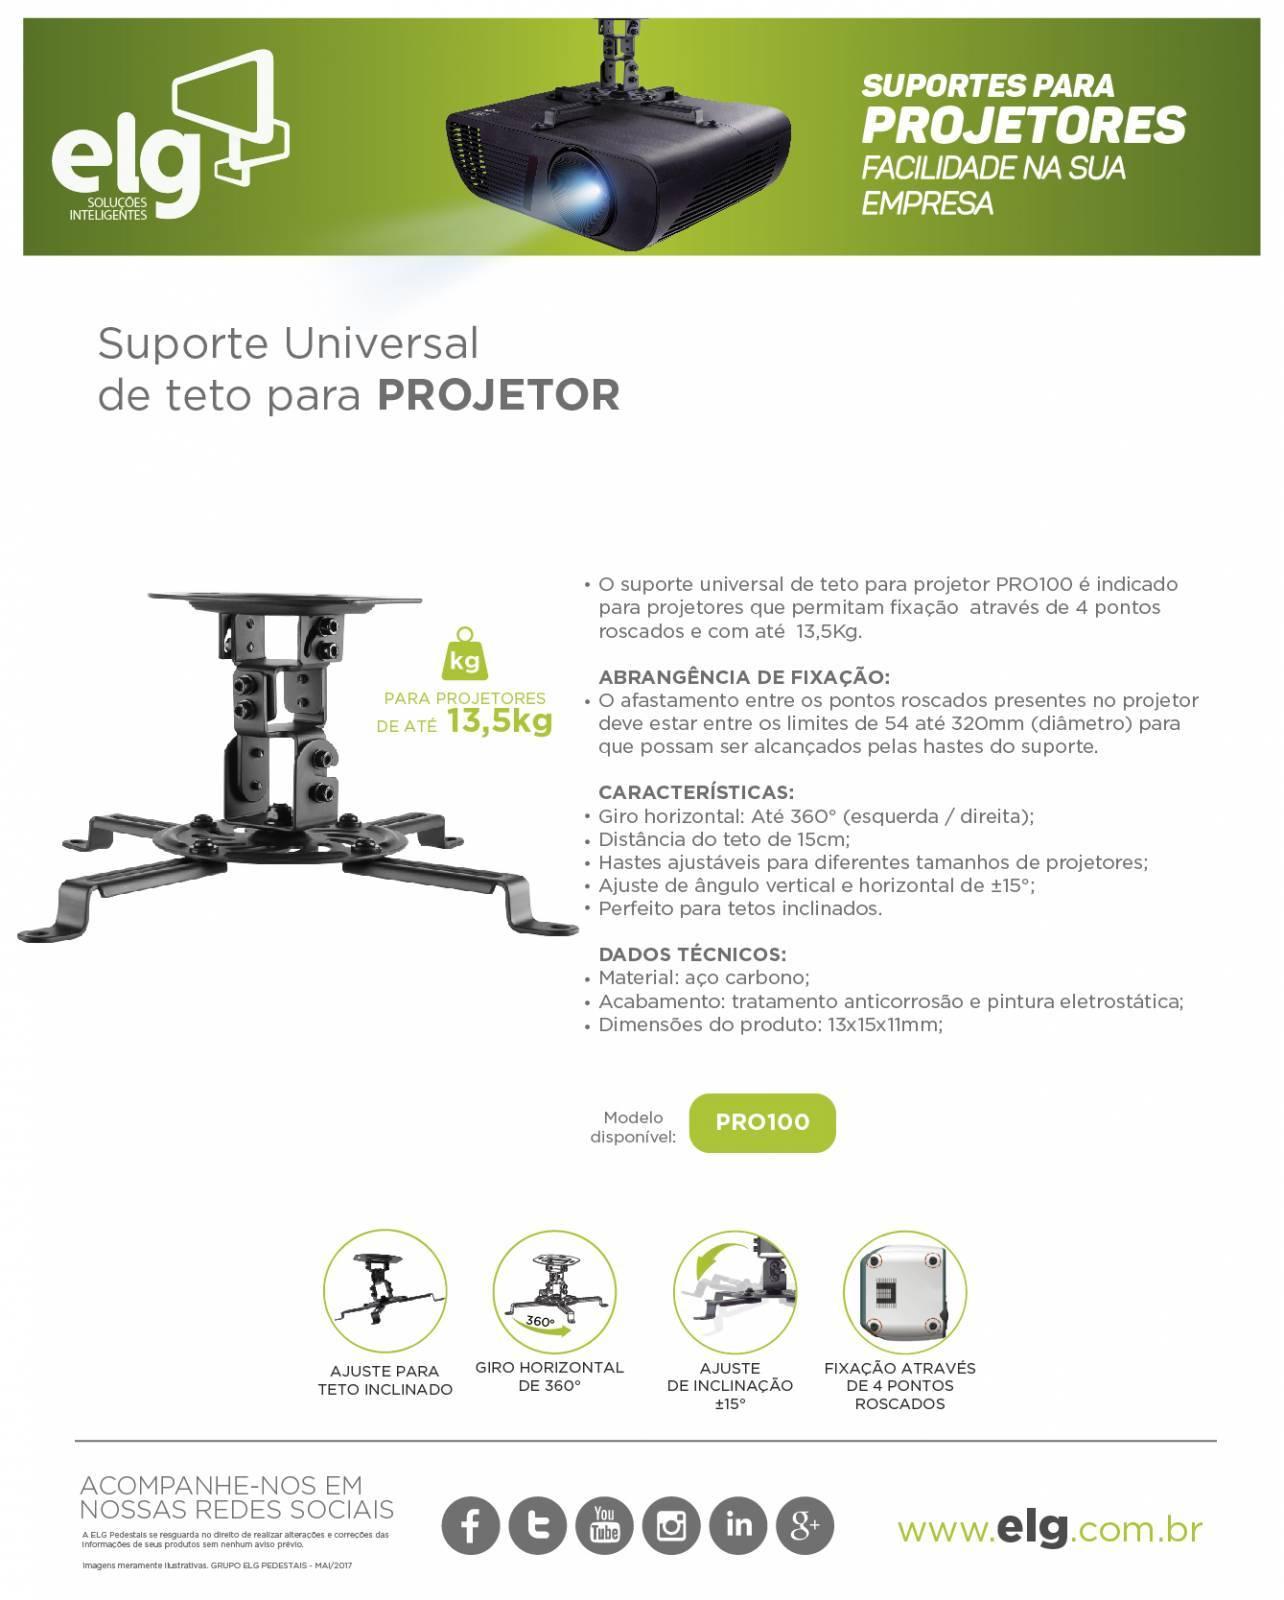 Suporte p/ Projetor PRO100 Branco - ELG - Ilha Suportes